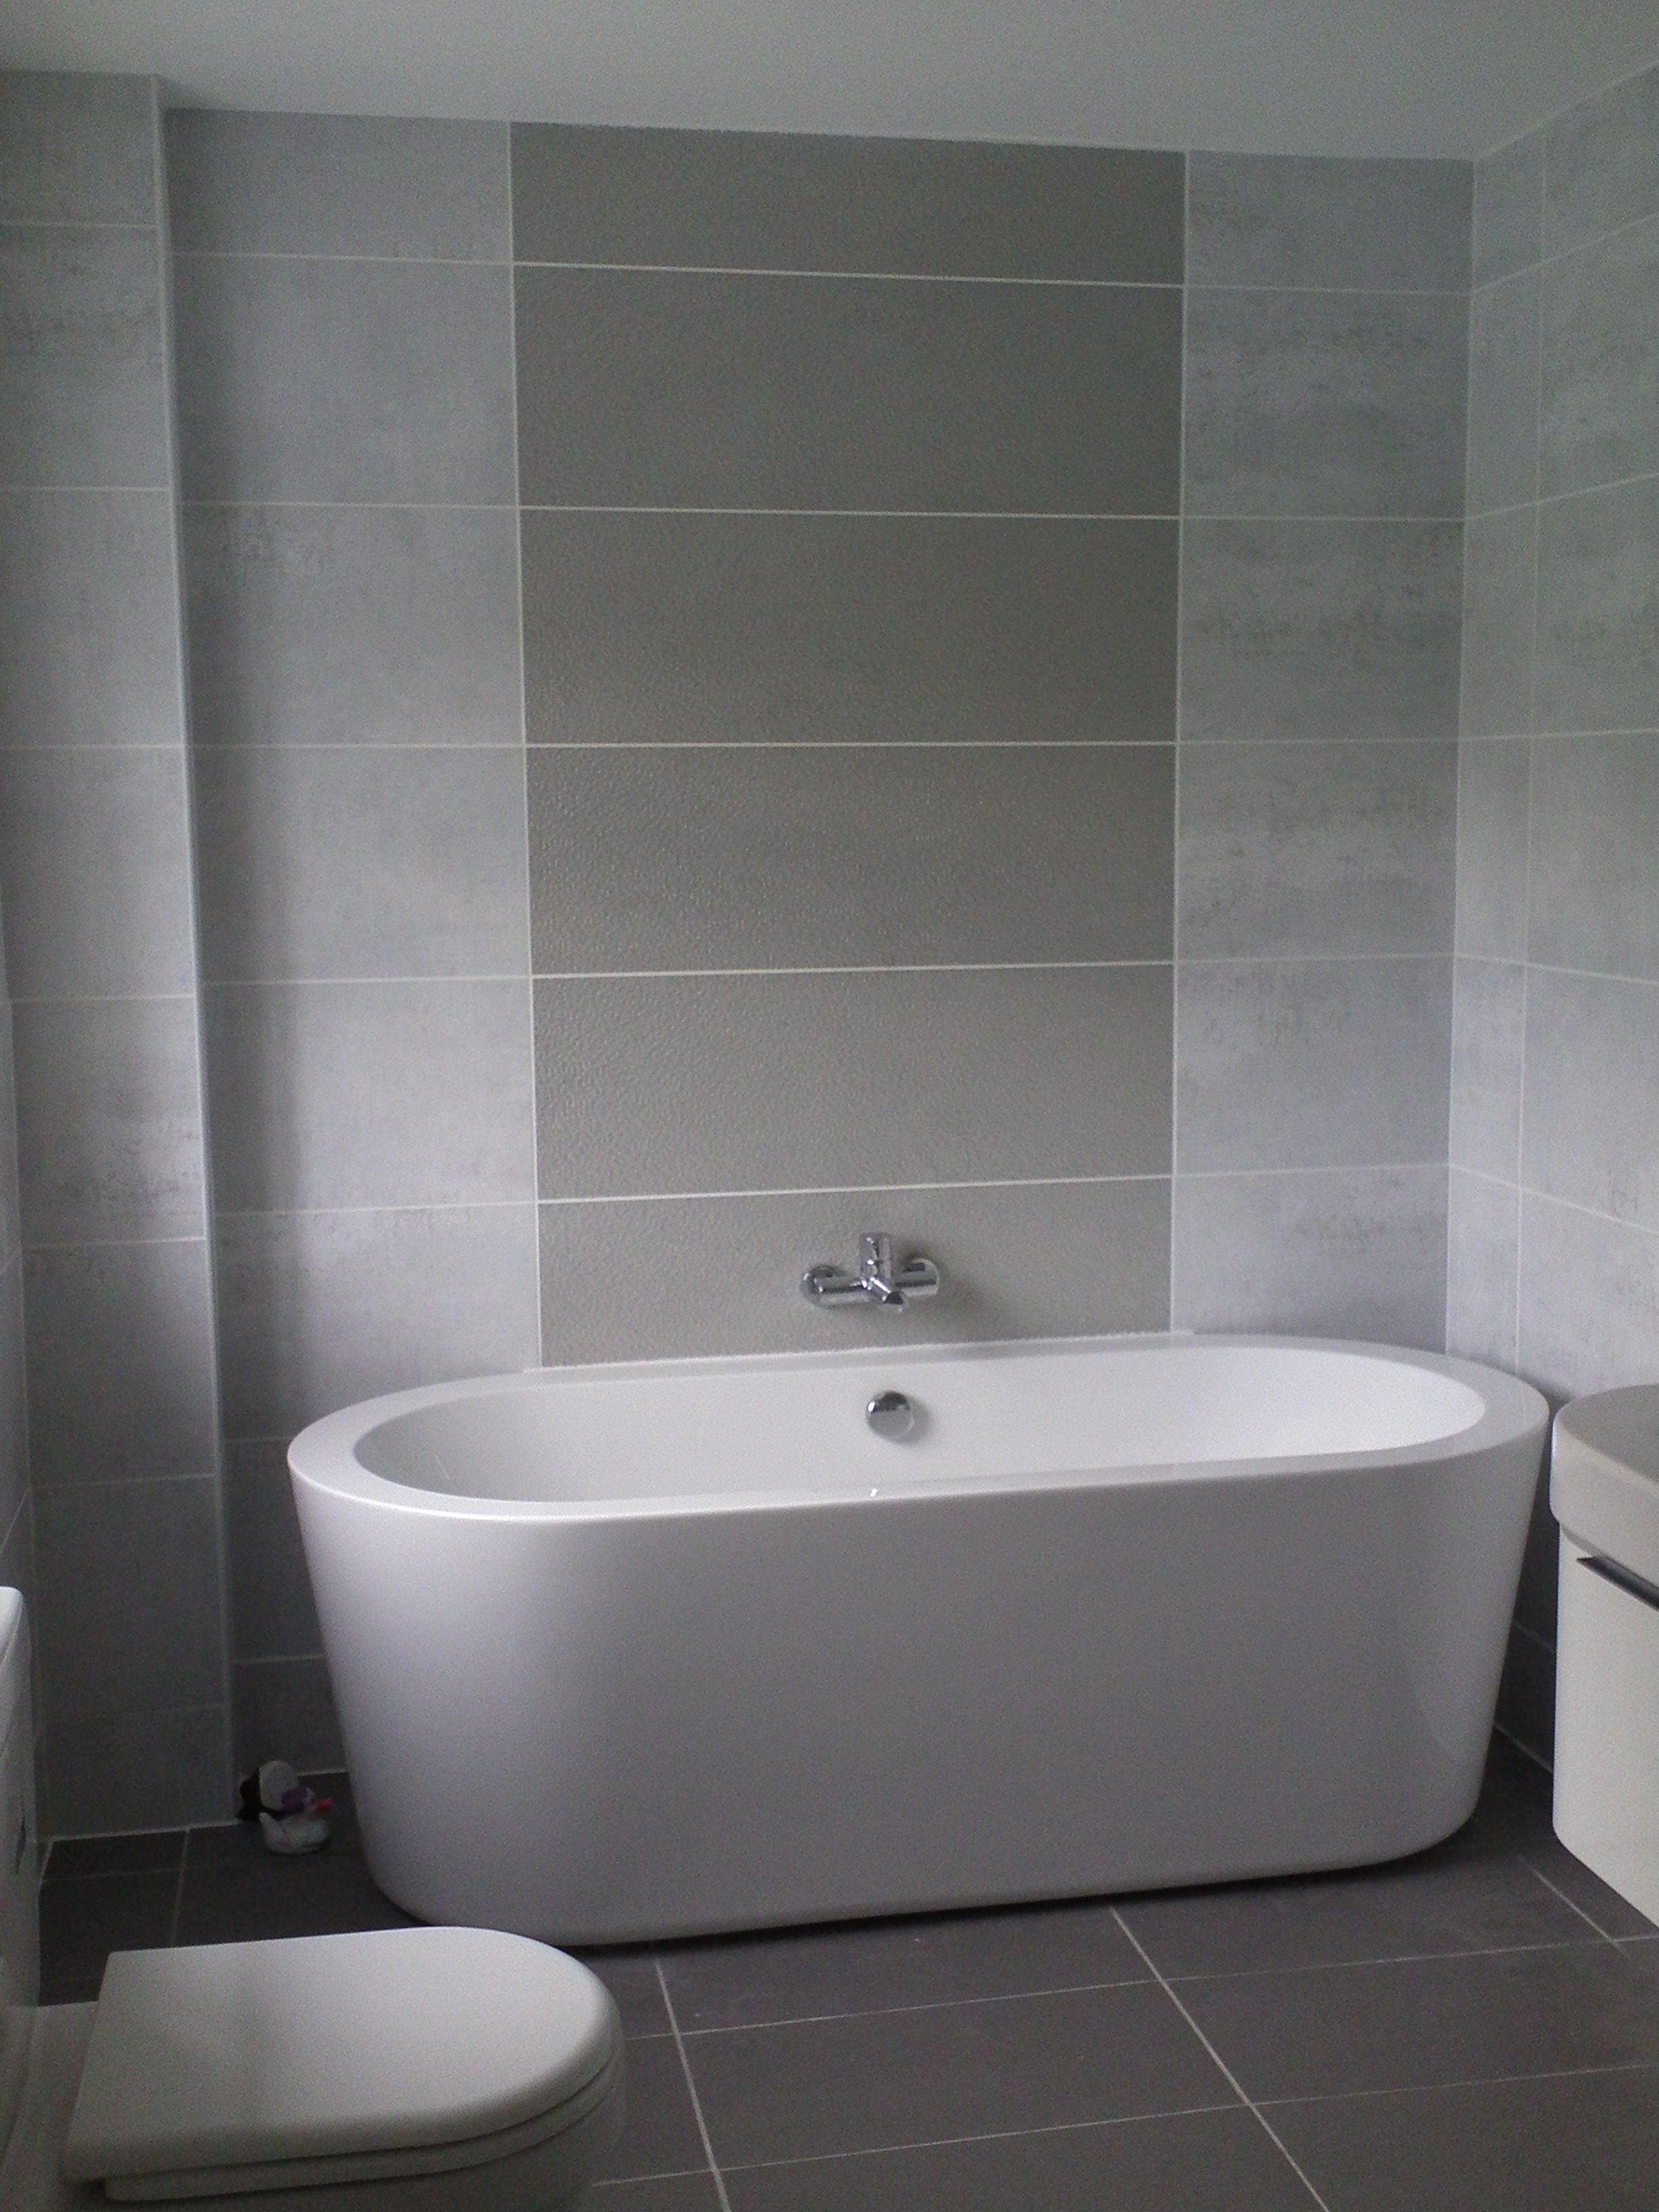 grey bathroom wall and floor tiles  Google Search